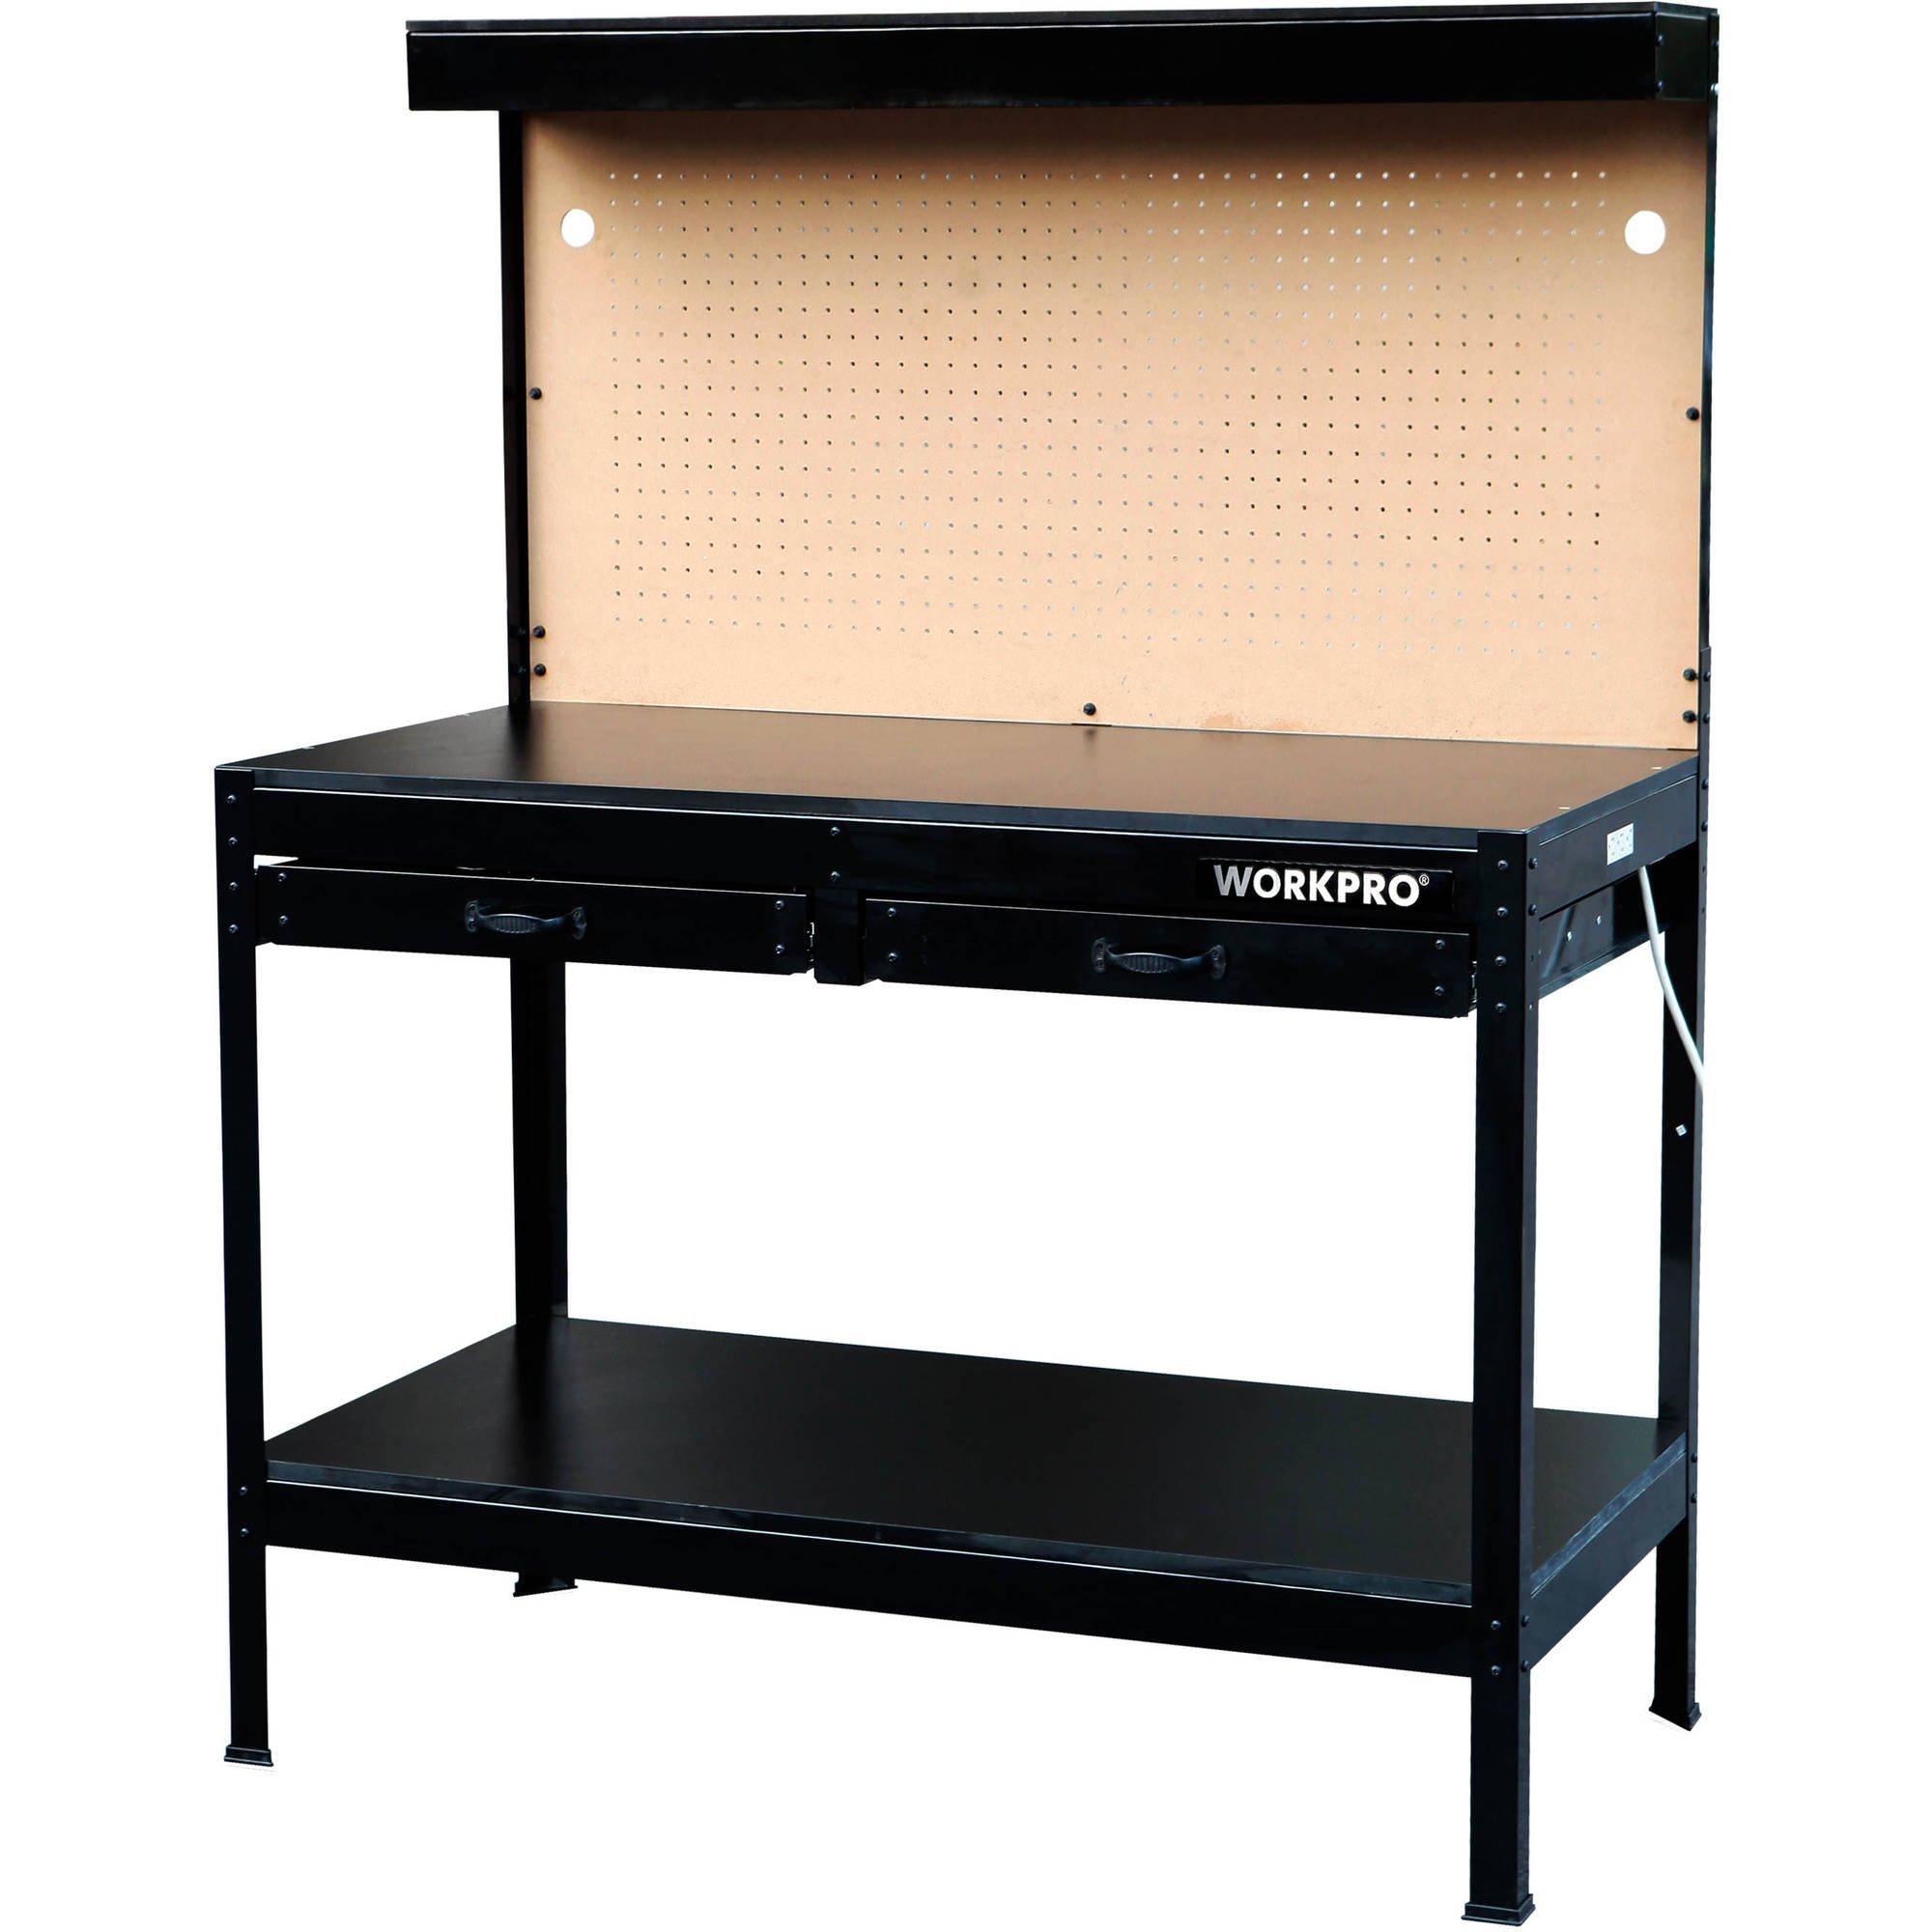 Multi purpose workbench with worklight